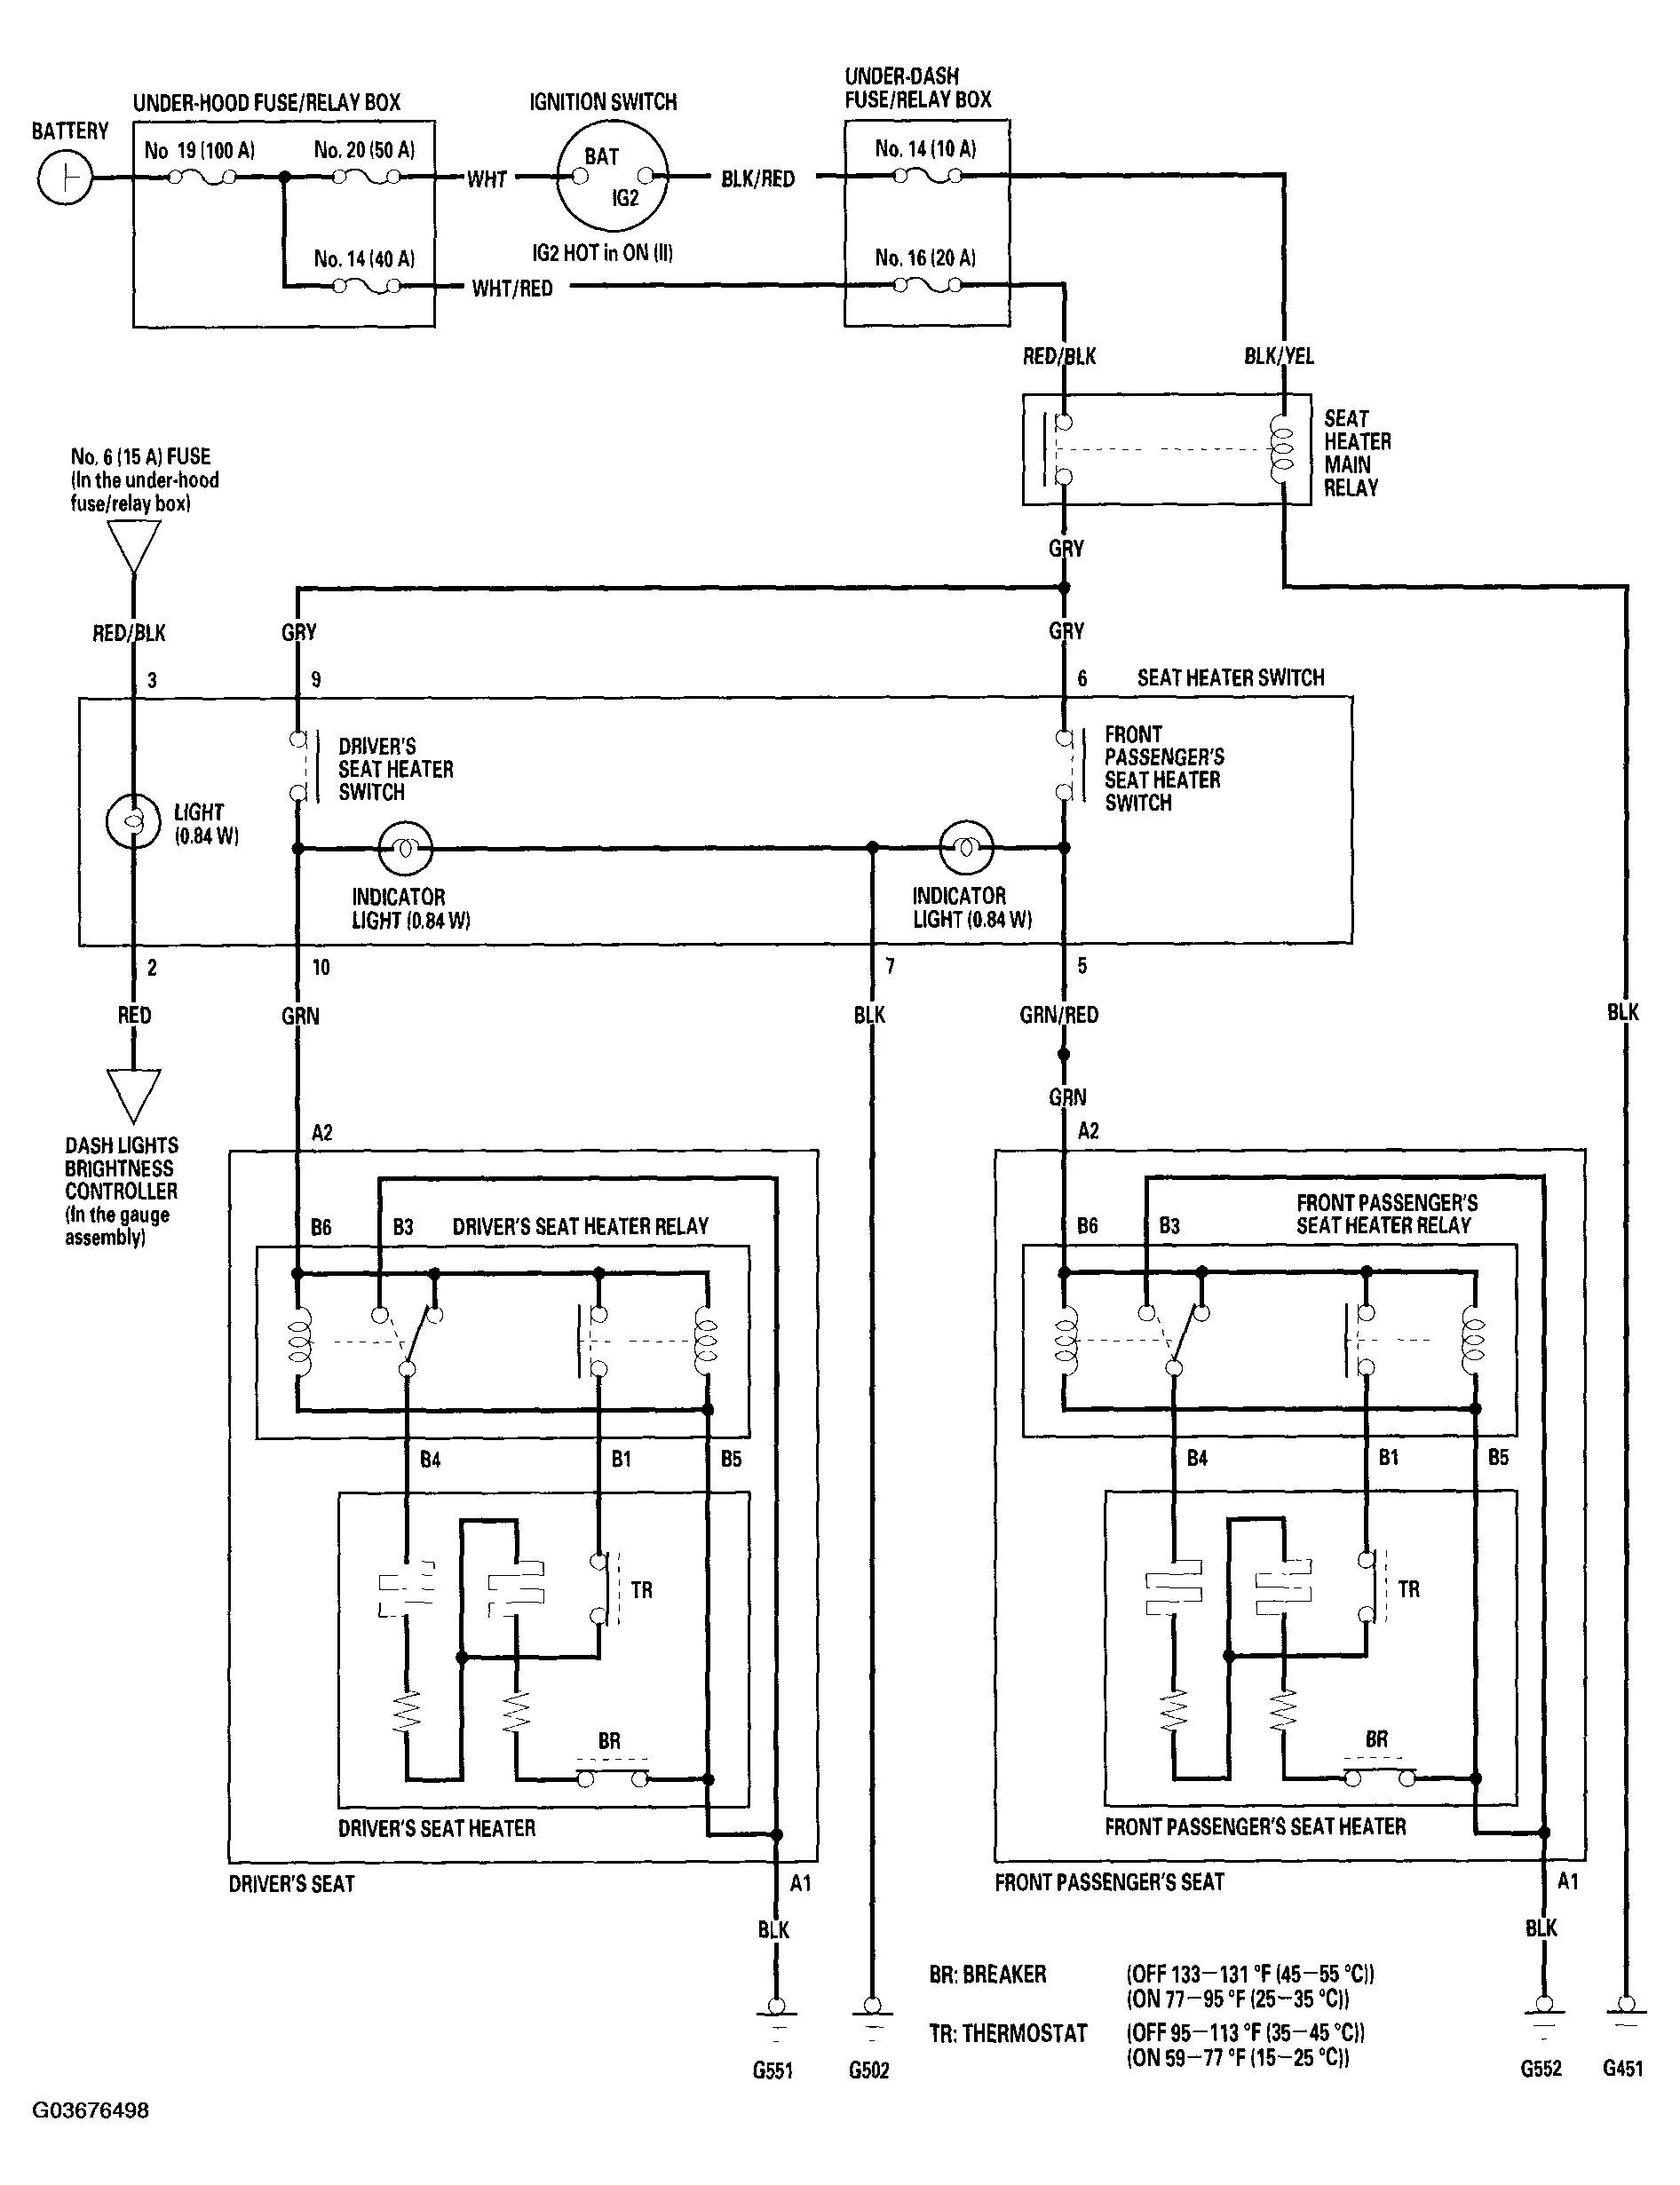 91 Honda Accord Engine Diagram Best 2006 Honda Civic Relay Diagram • Electrical Outlet Symbol 2018 Of 91 Honda Accord Engine Diagram